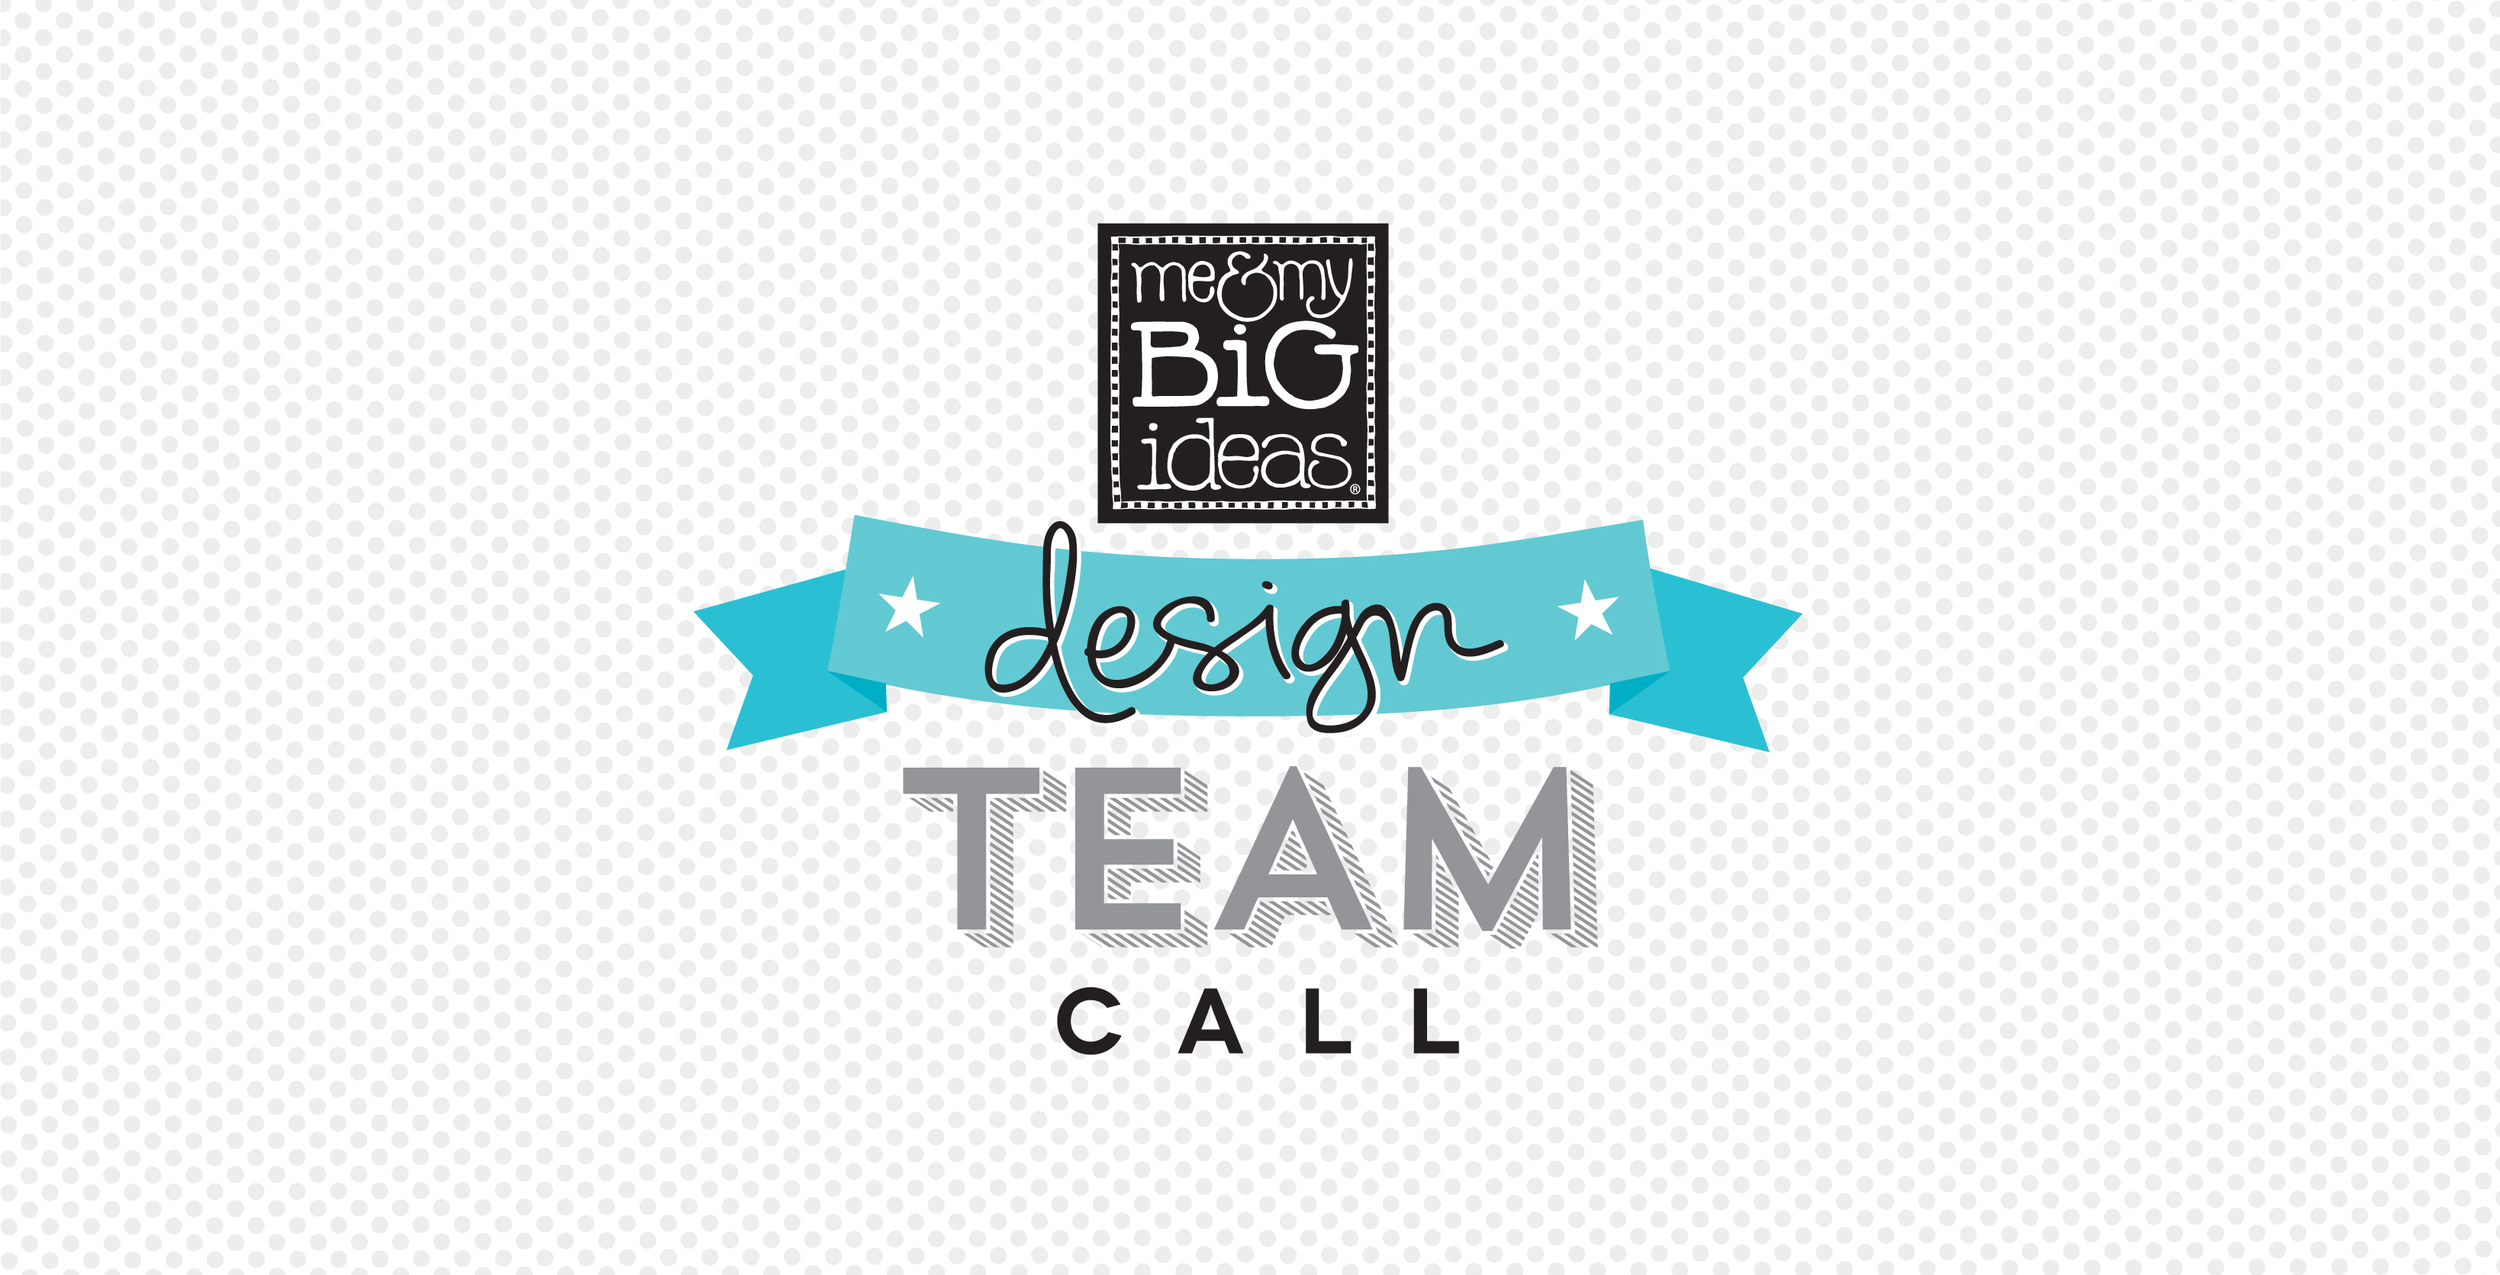 Mambi Design Team Call.jpg